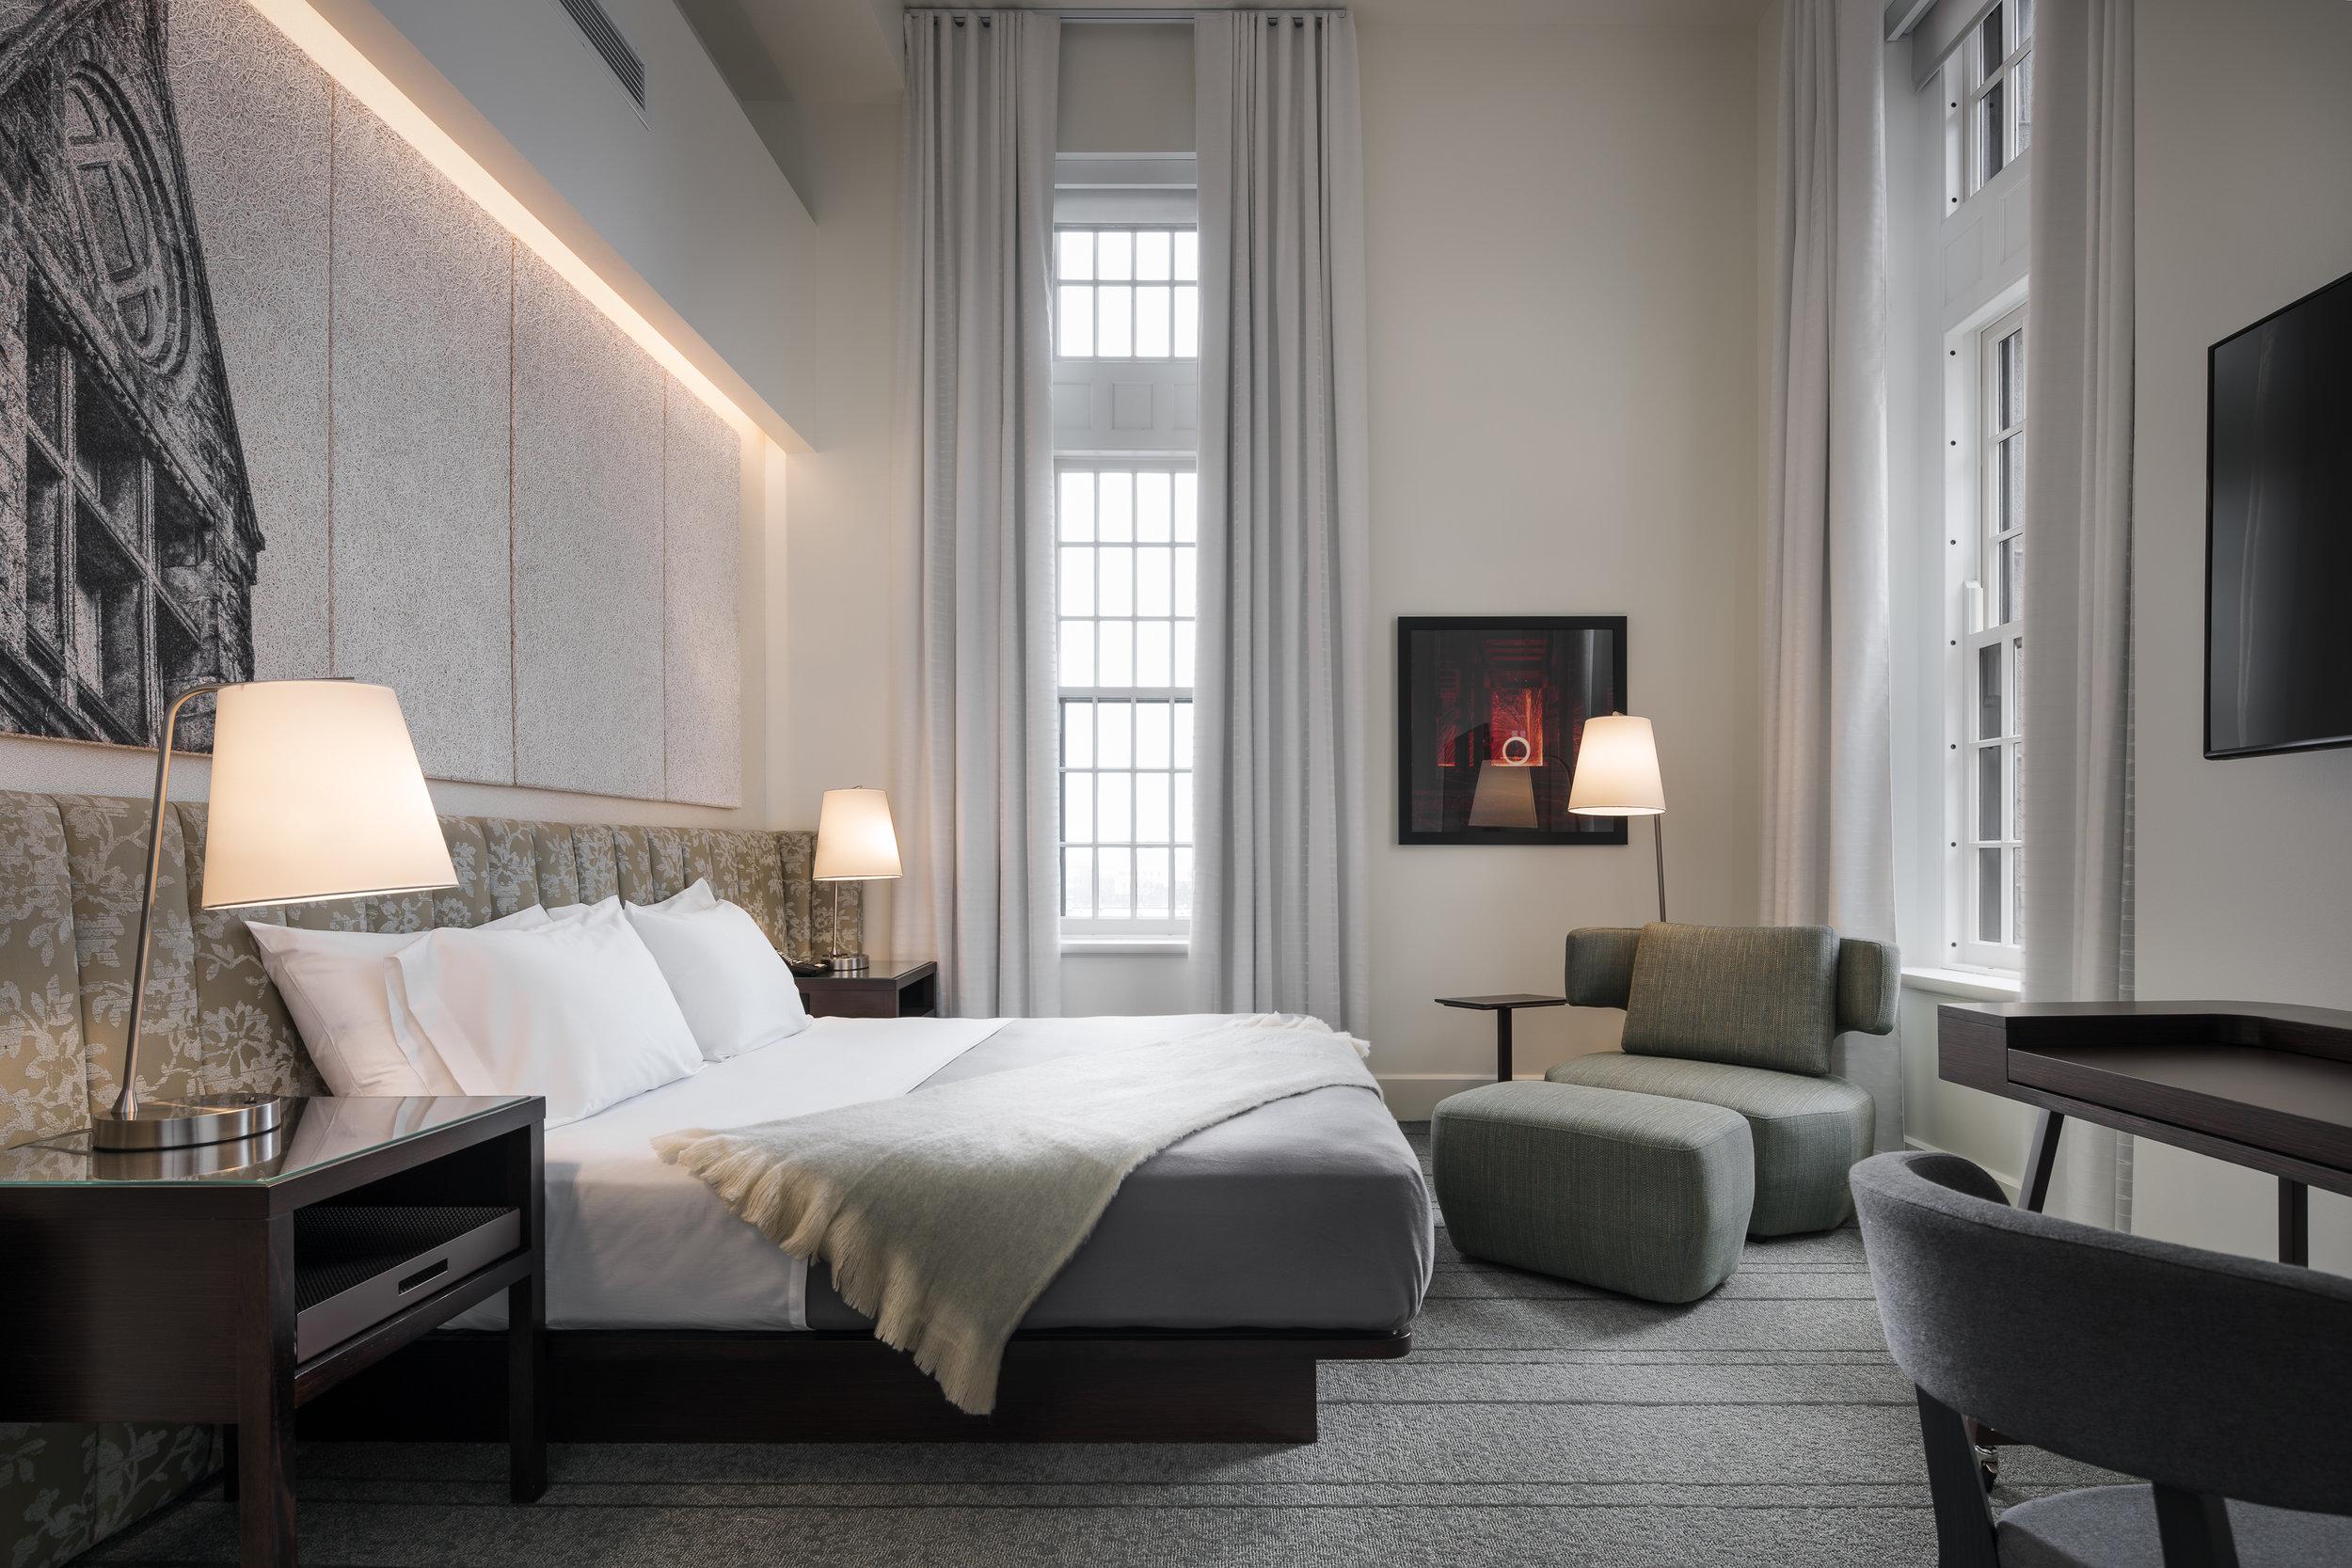 HotelHenry-2880px-7.jpg